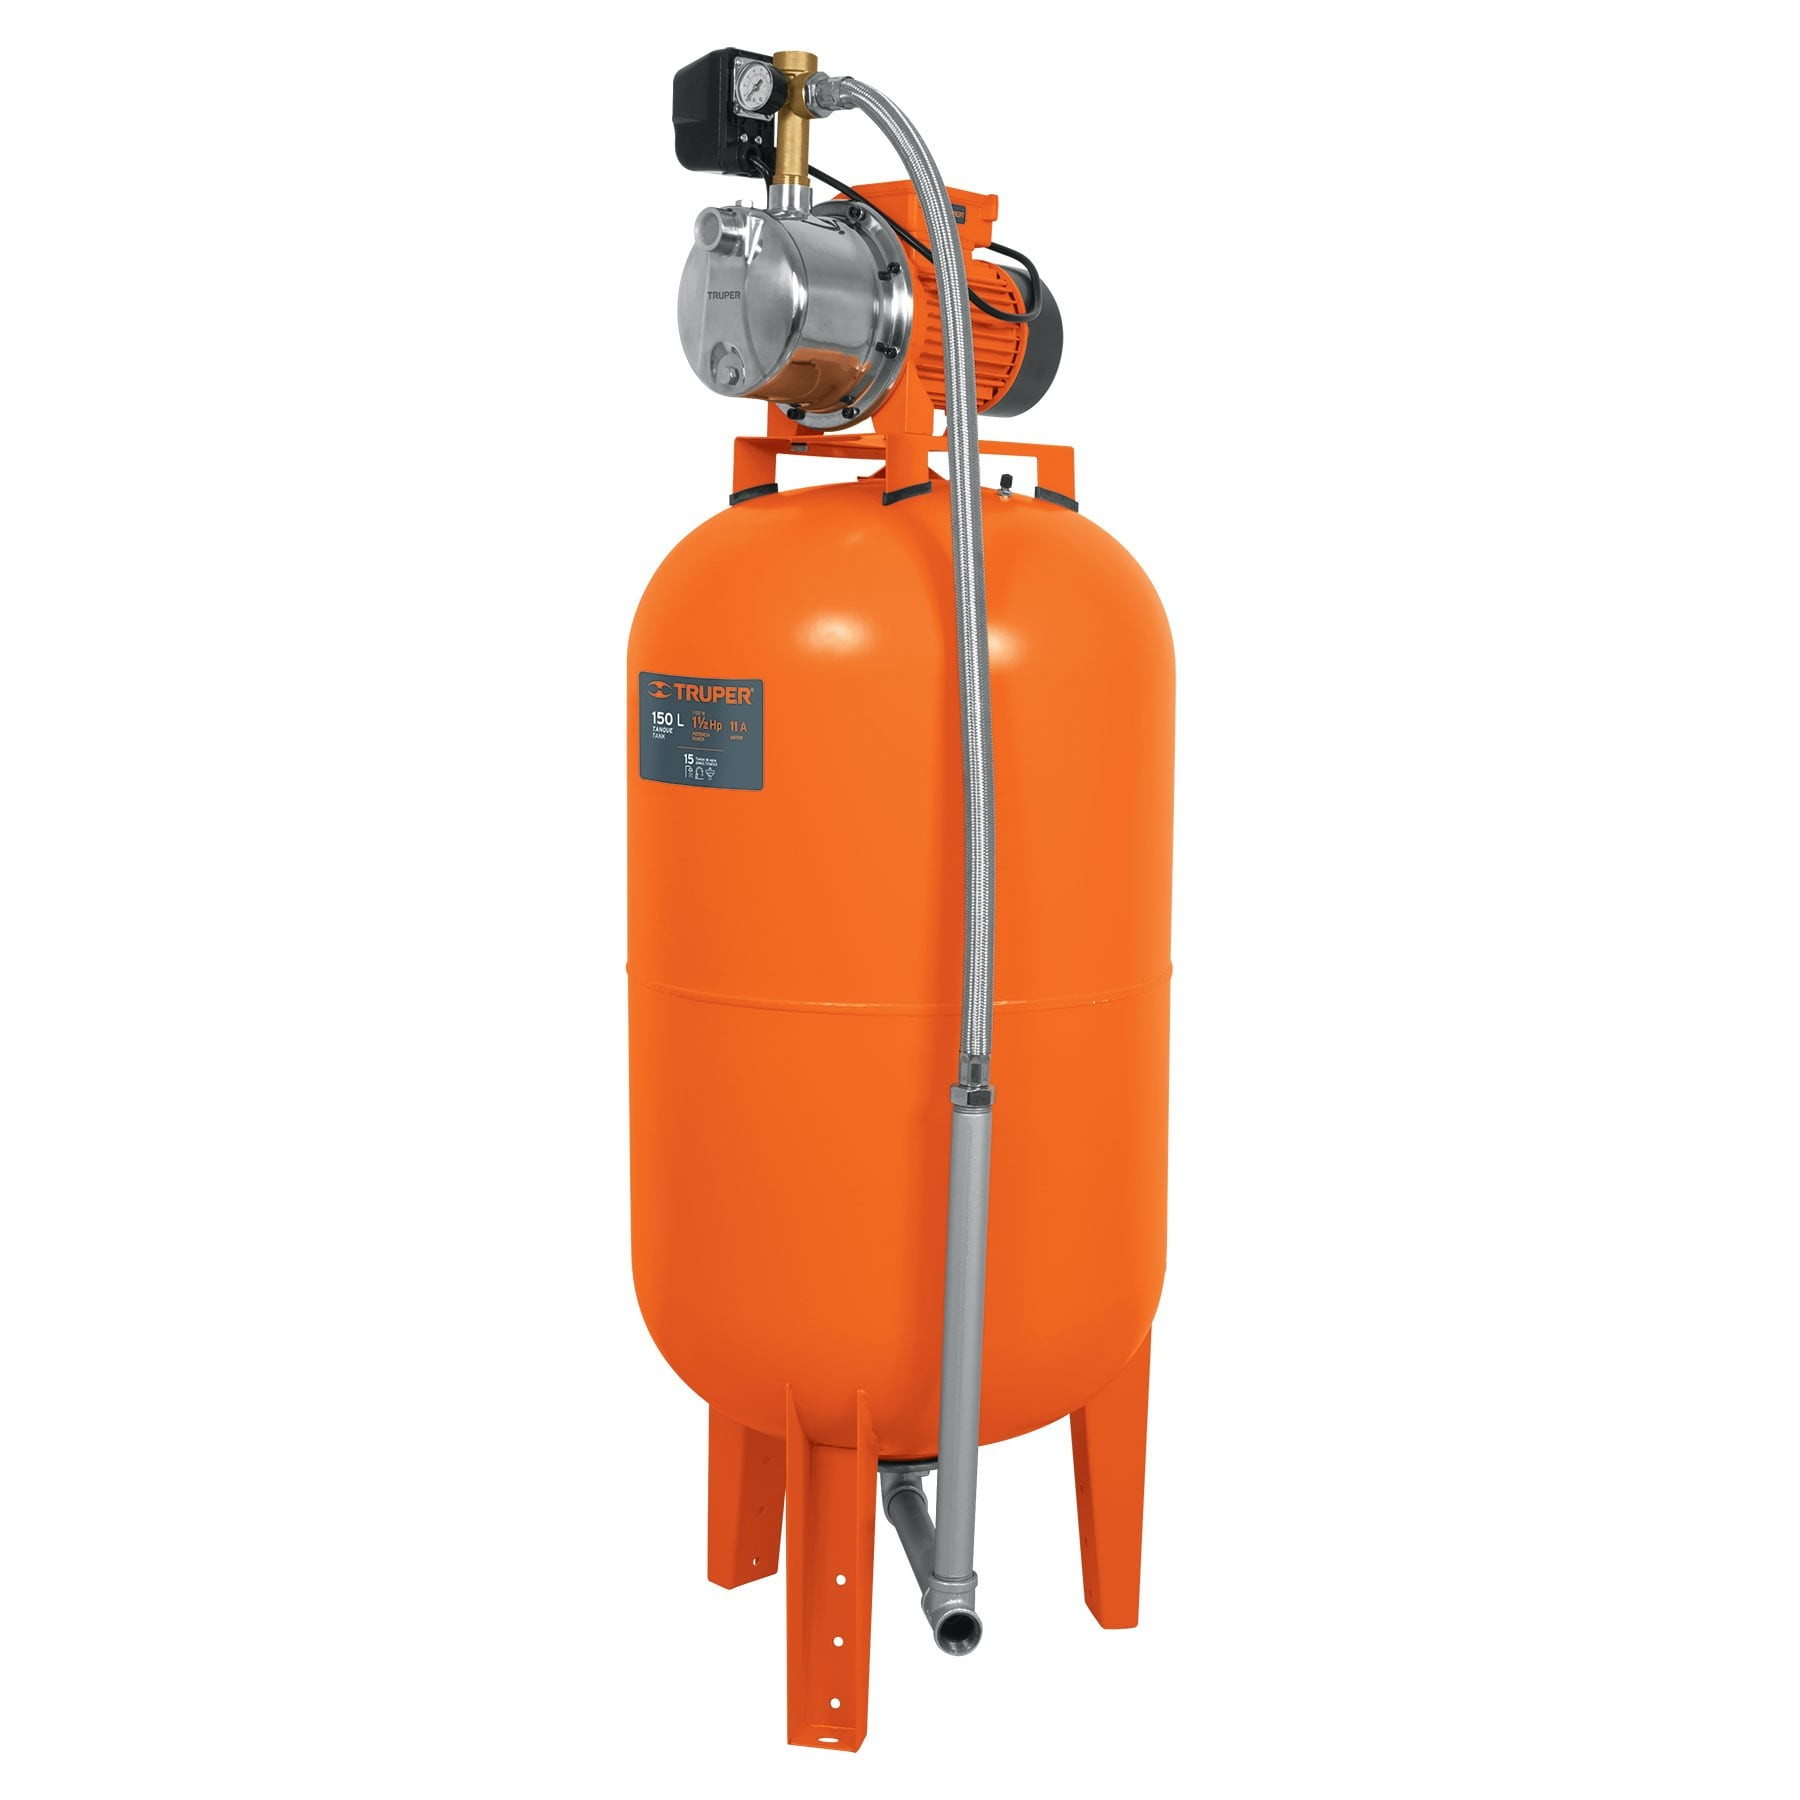 Bomba hidroneumática 1-1/2 HP, 150 litros